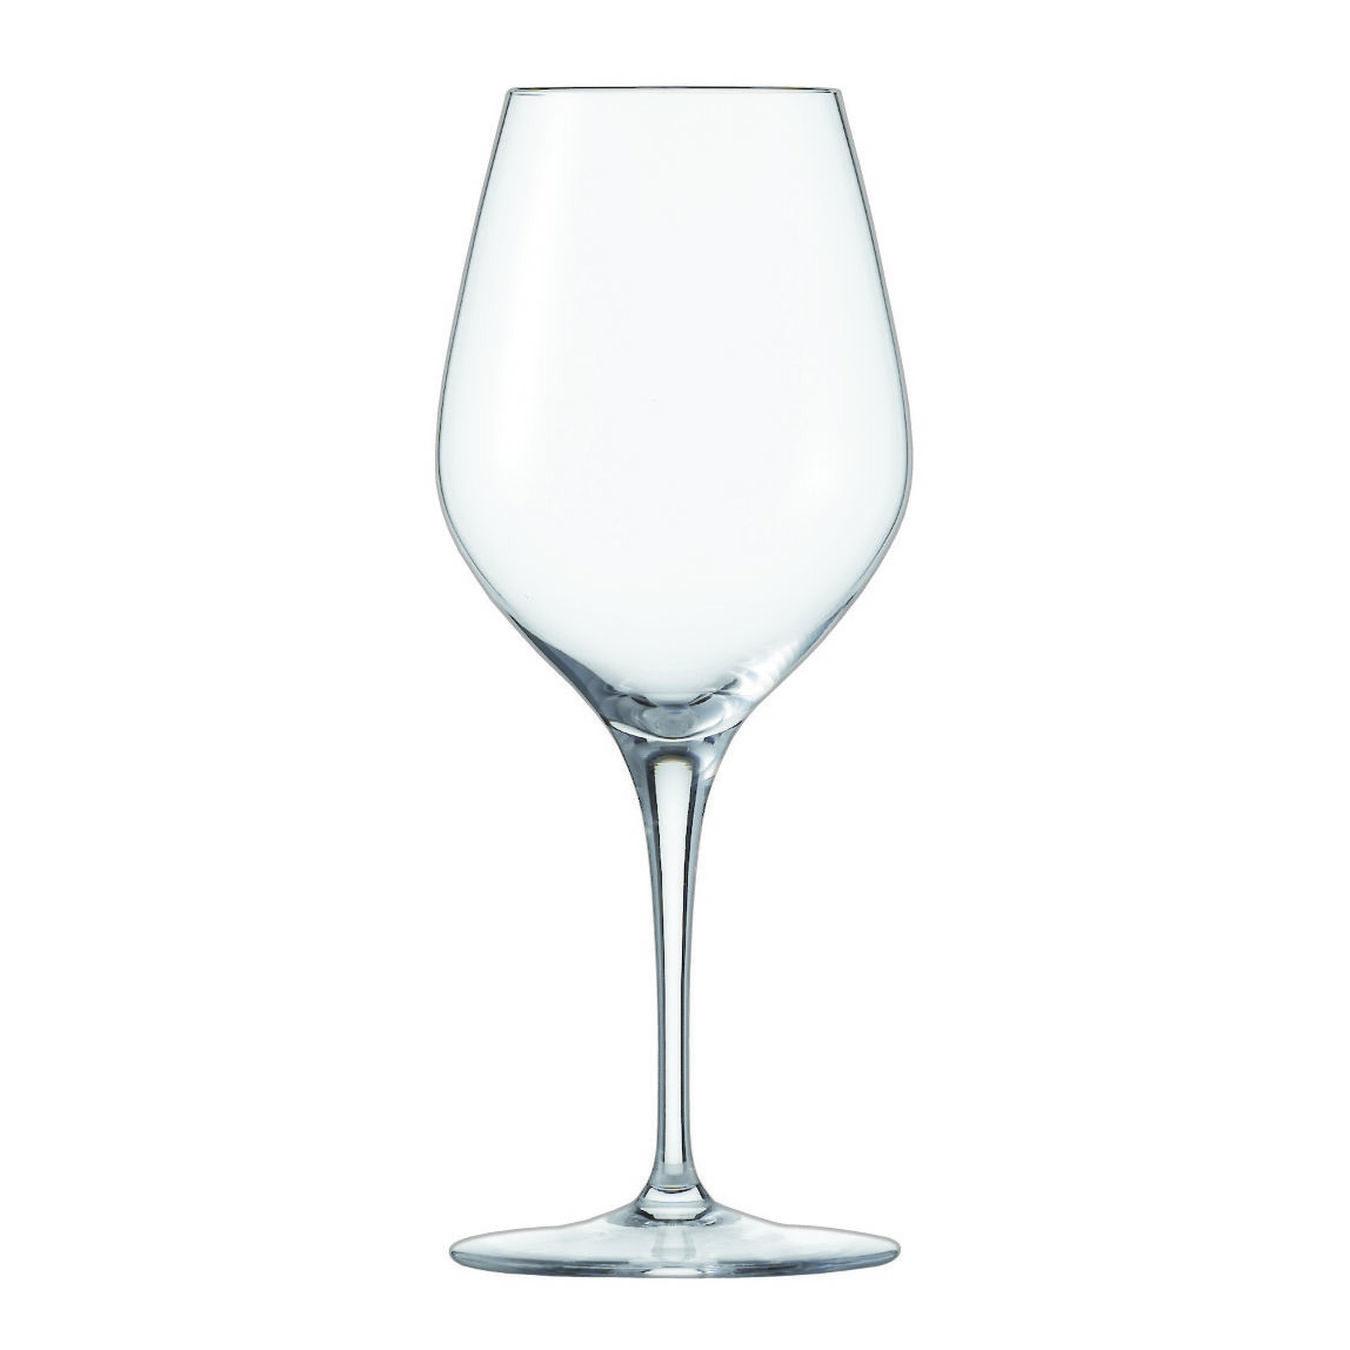 Taça para vinho branco 330 ml,,large 1